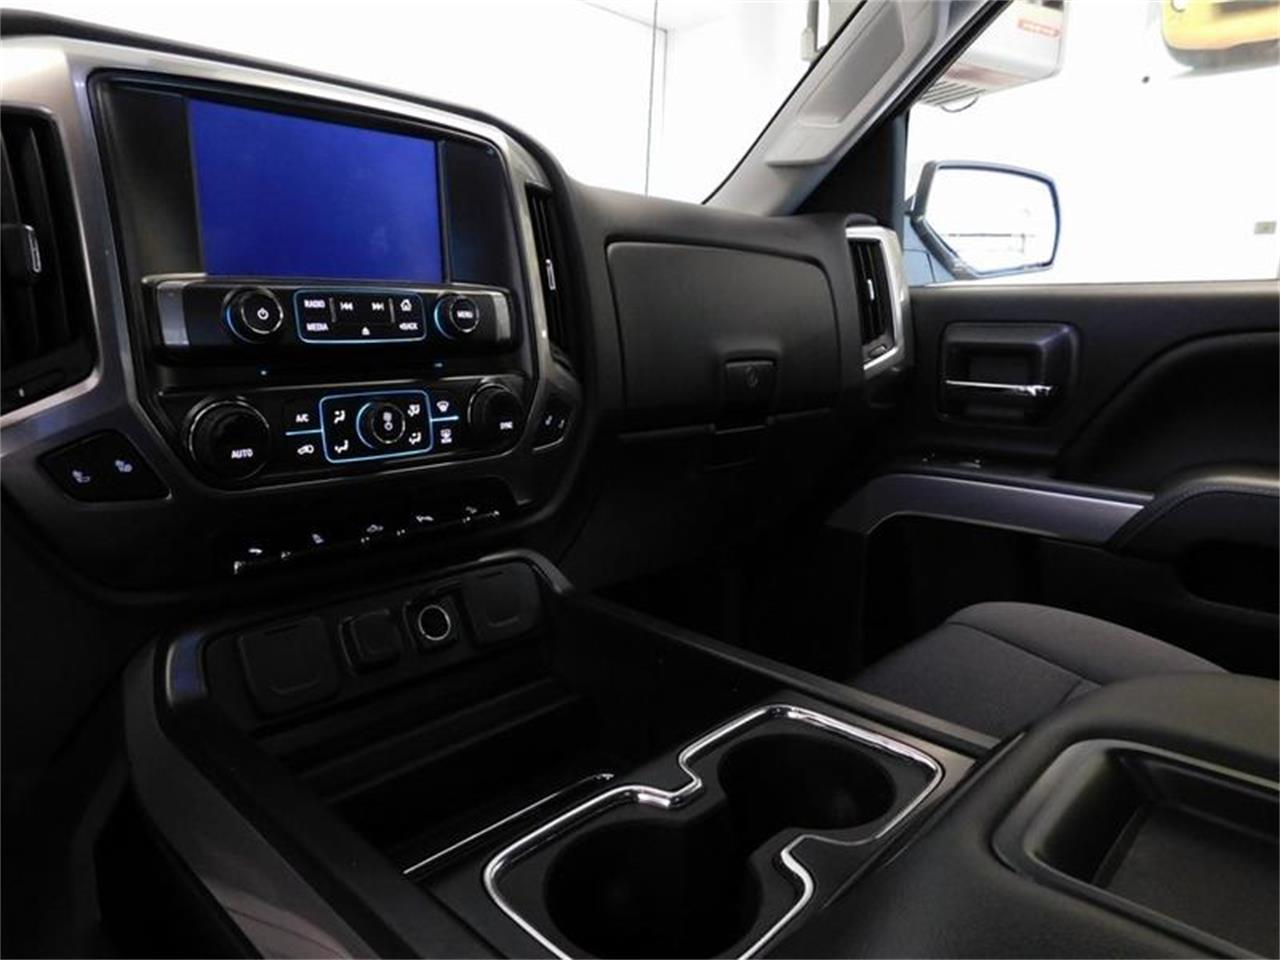 2015 Chevrolet Silverado For Sale Cc 1144295 Chevy Center Console Large Picture Of 15 Oixz